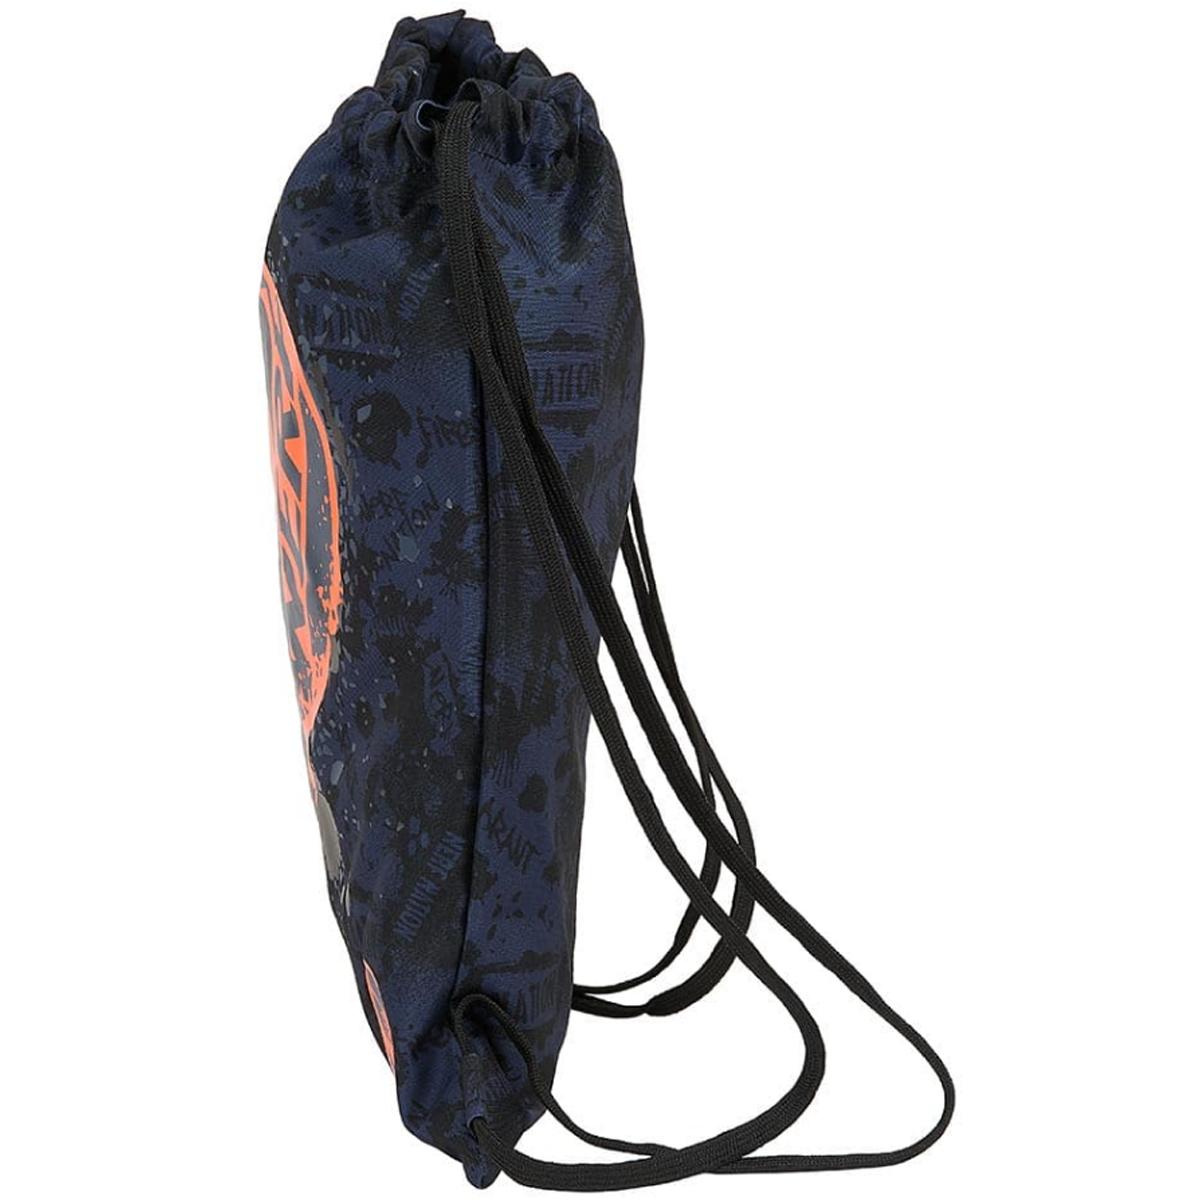 Nerf Gymbag - 40 x 34 cm - Polyester